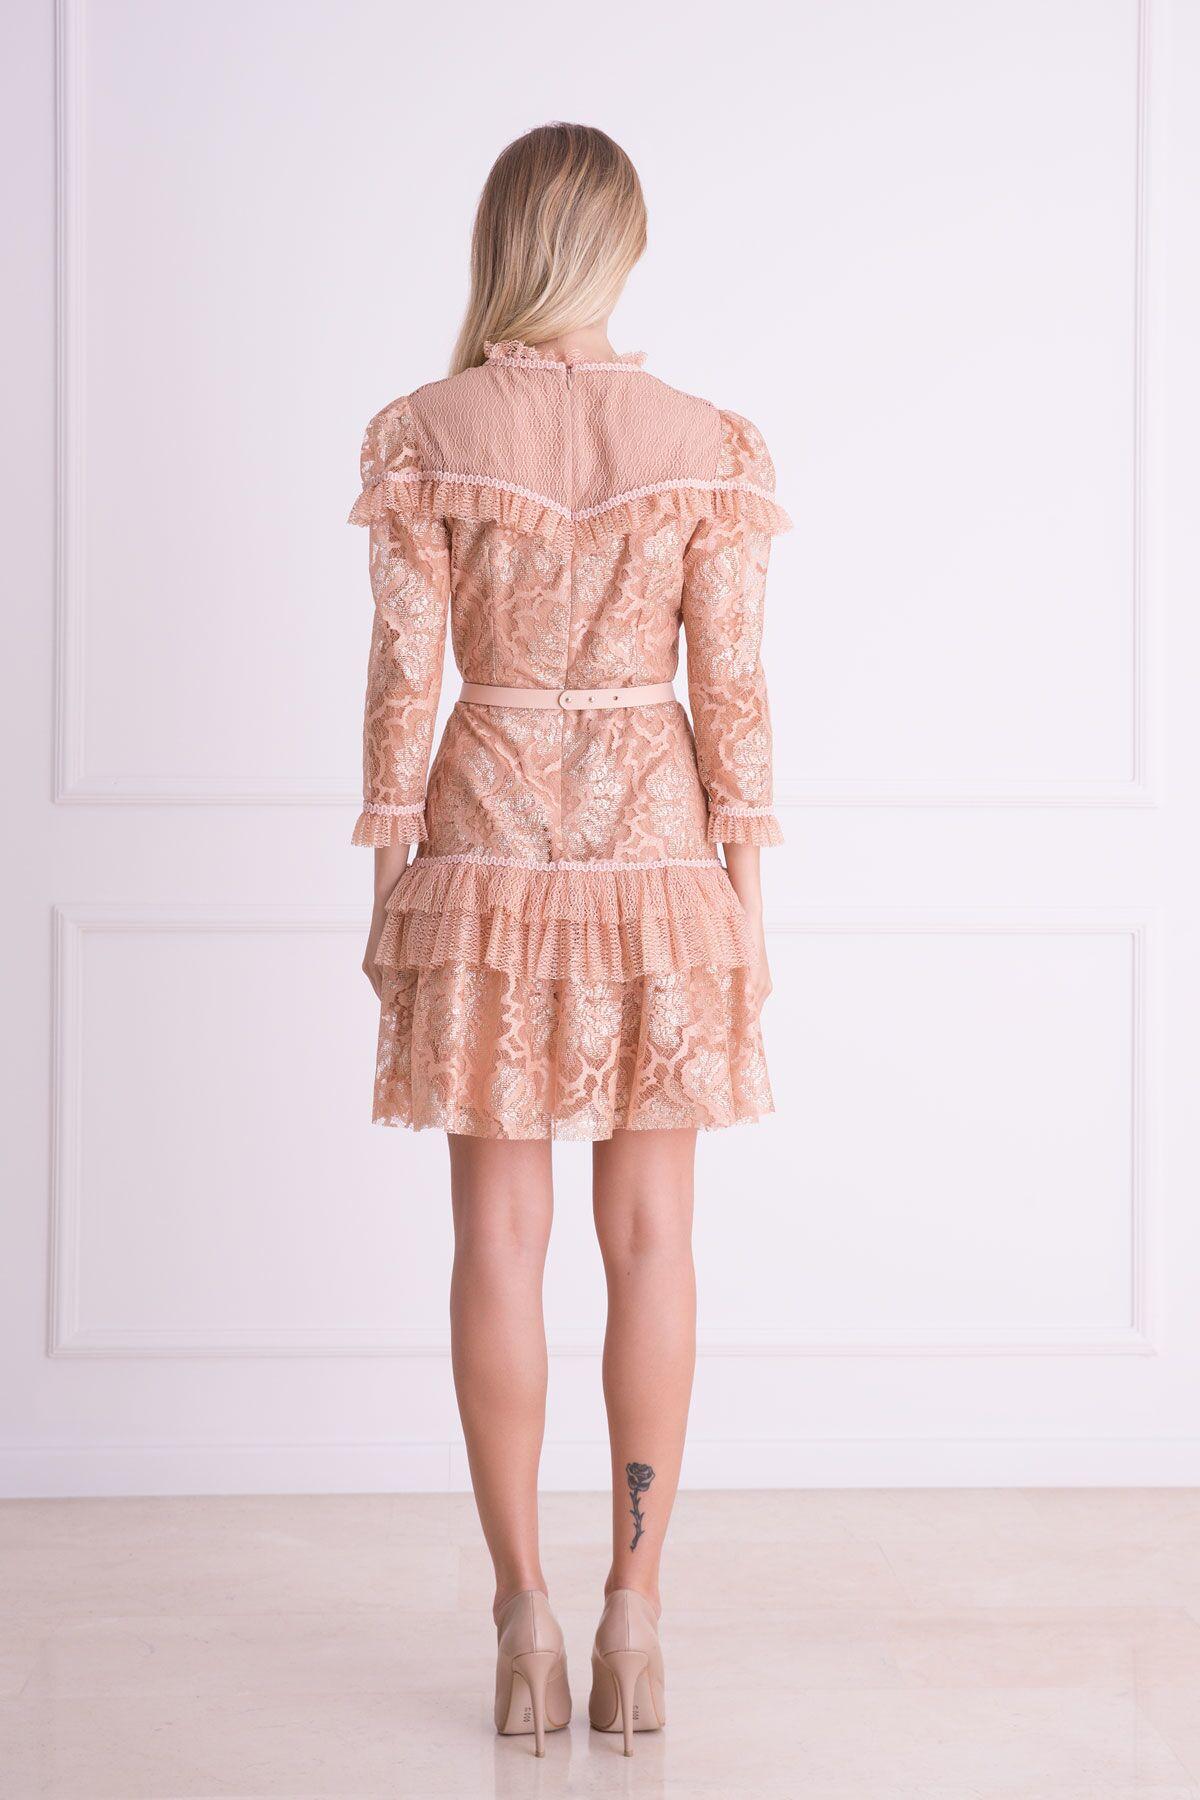 Kemer Detaylı Somon Rengi Dantel Mini Elbise